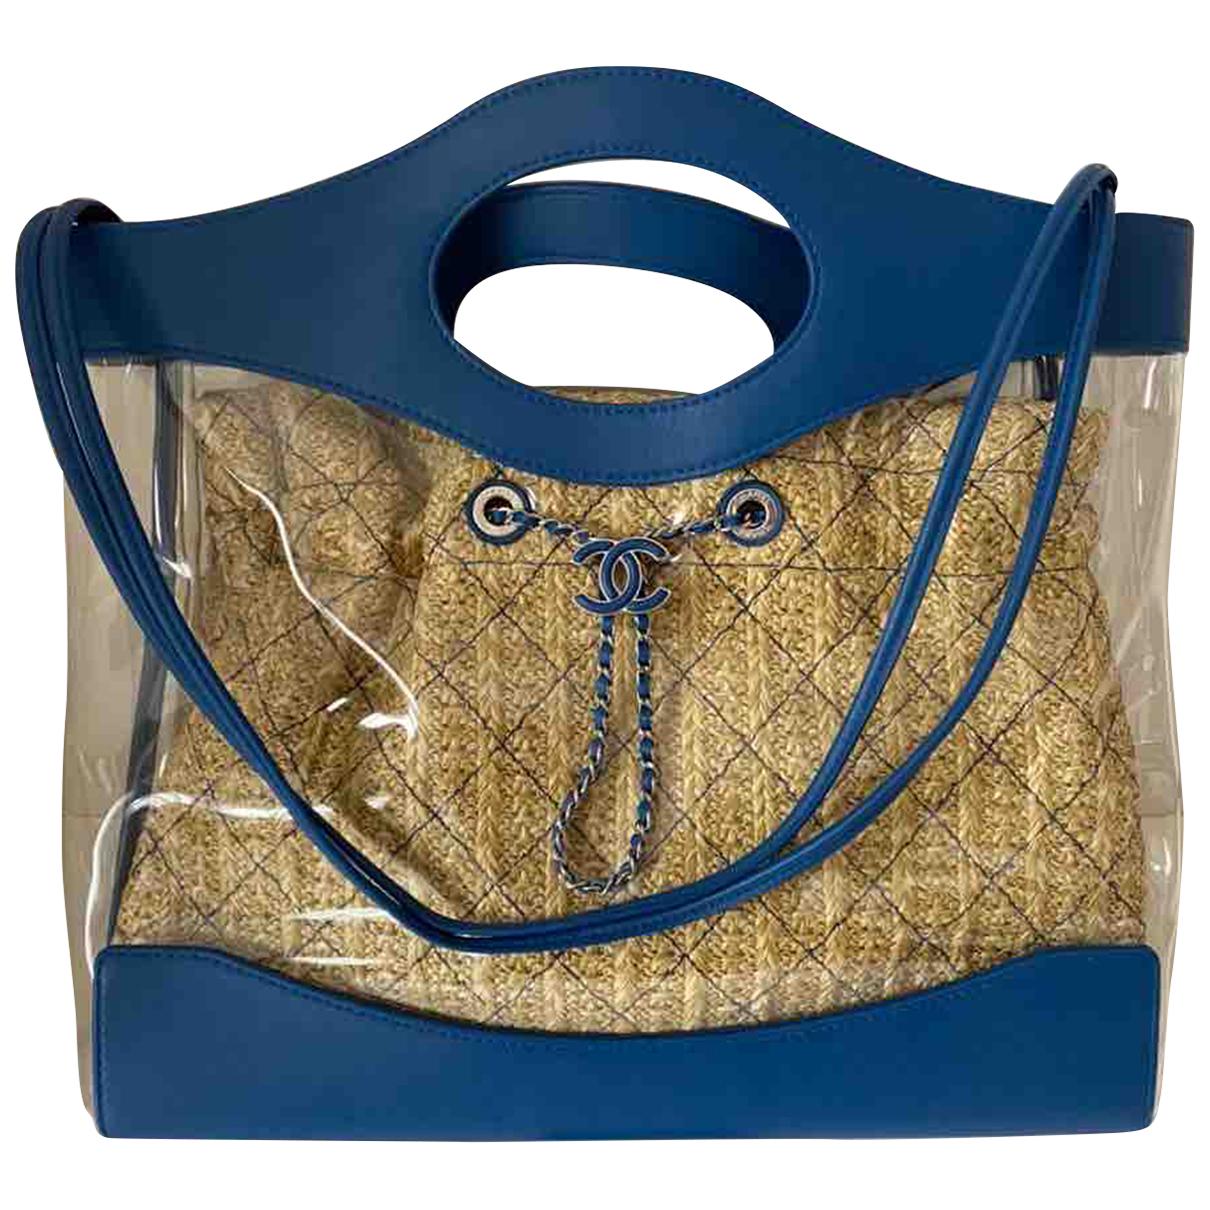 Chanel - Sac a main 31 pour femme - bleu